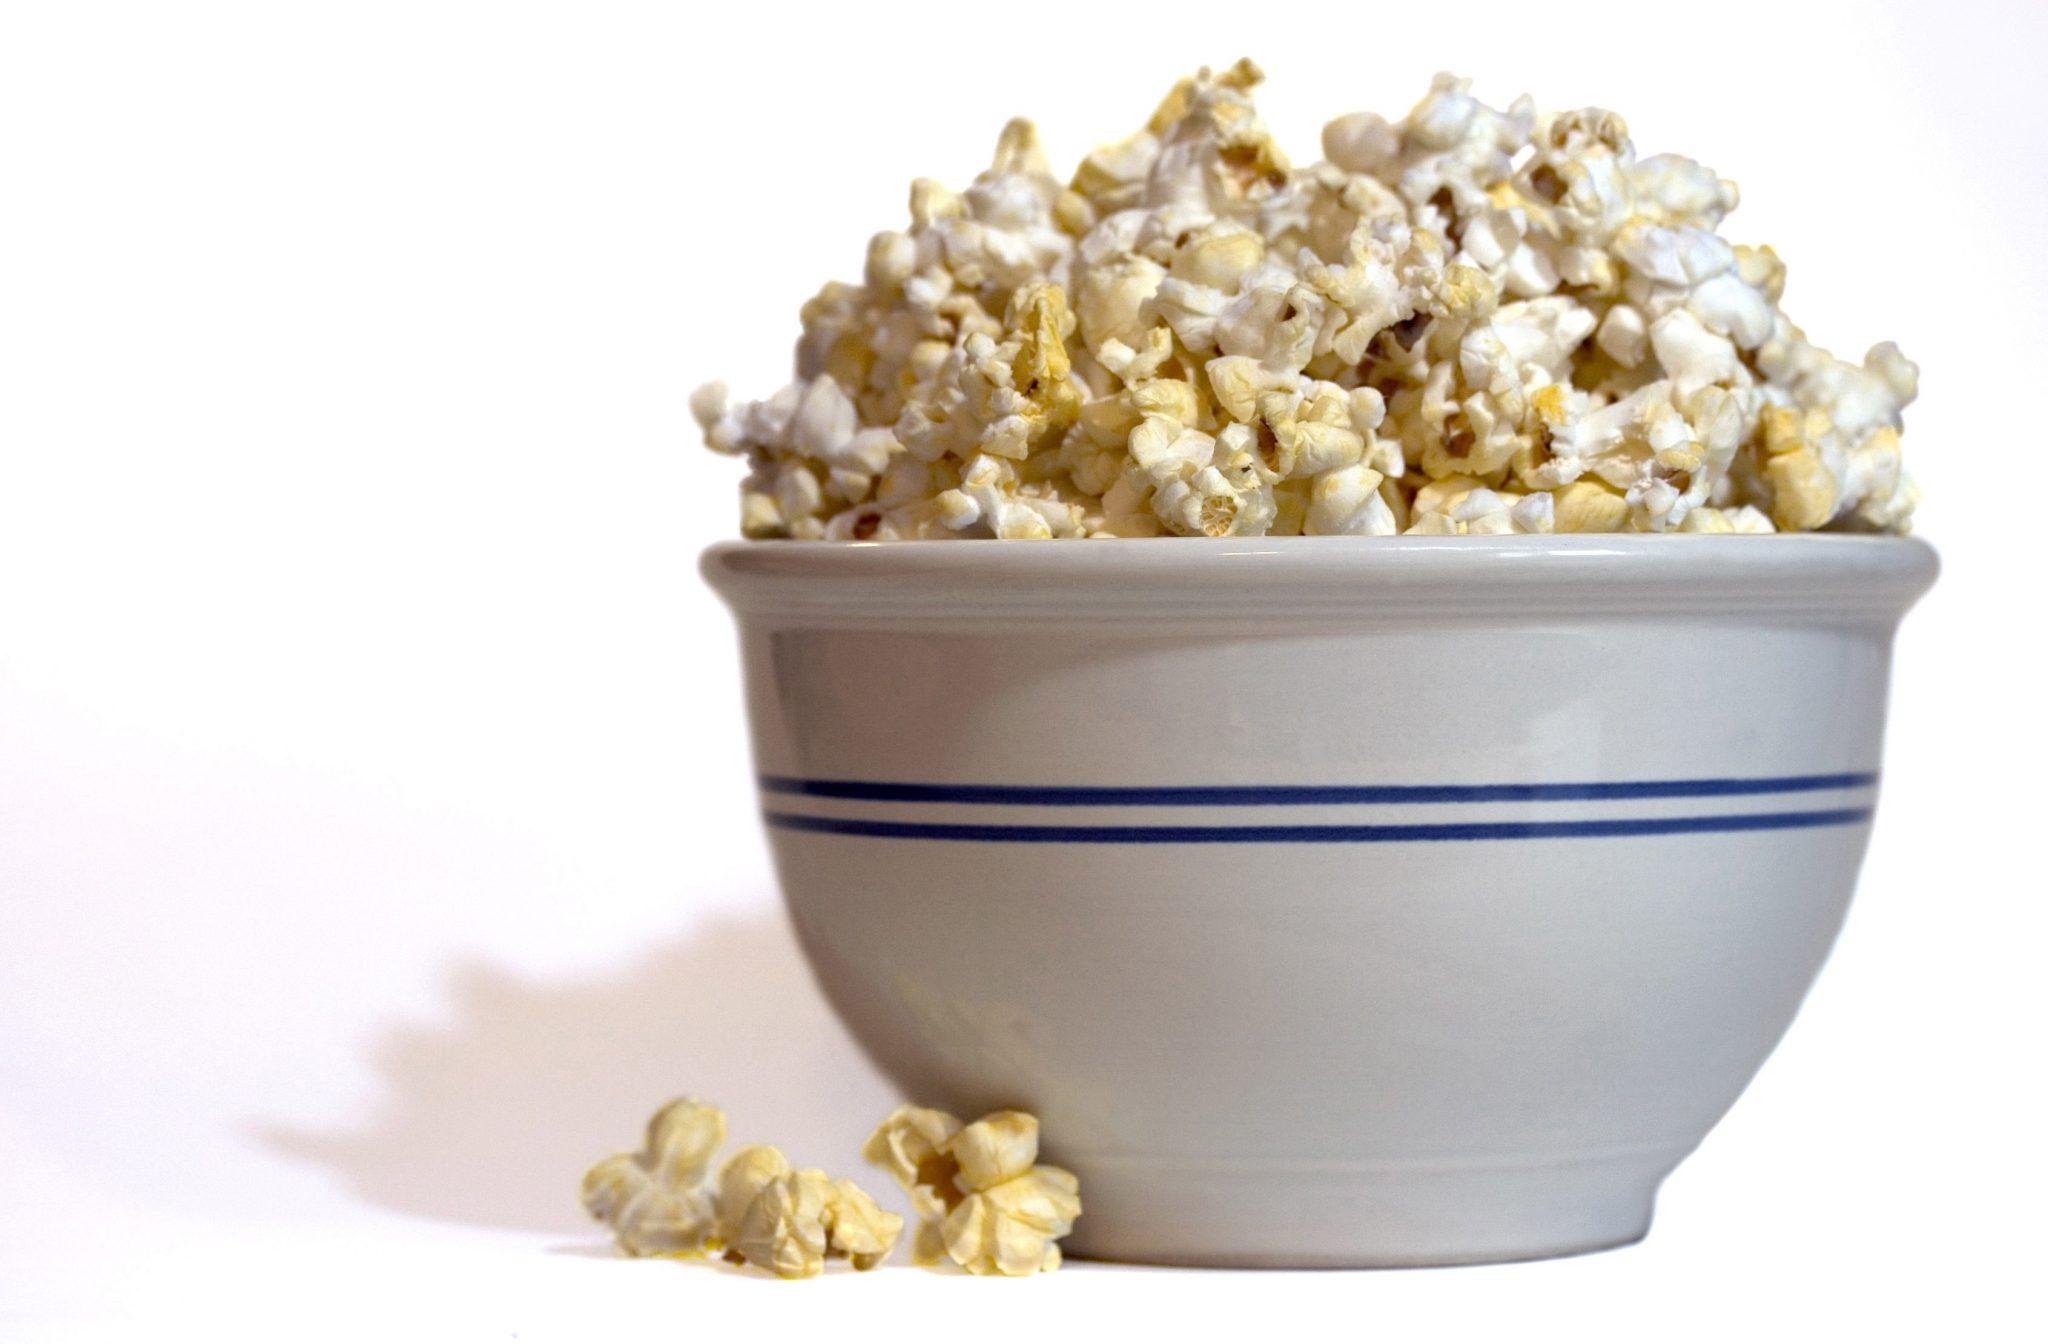 The Quintessential Movie Snack